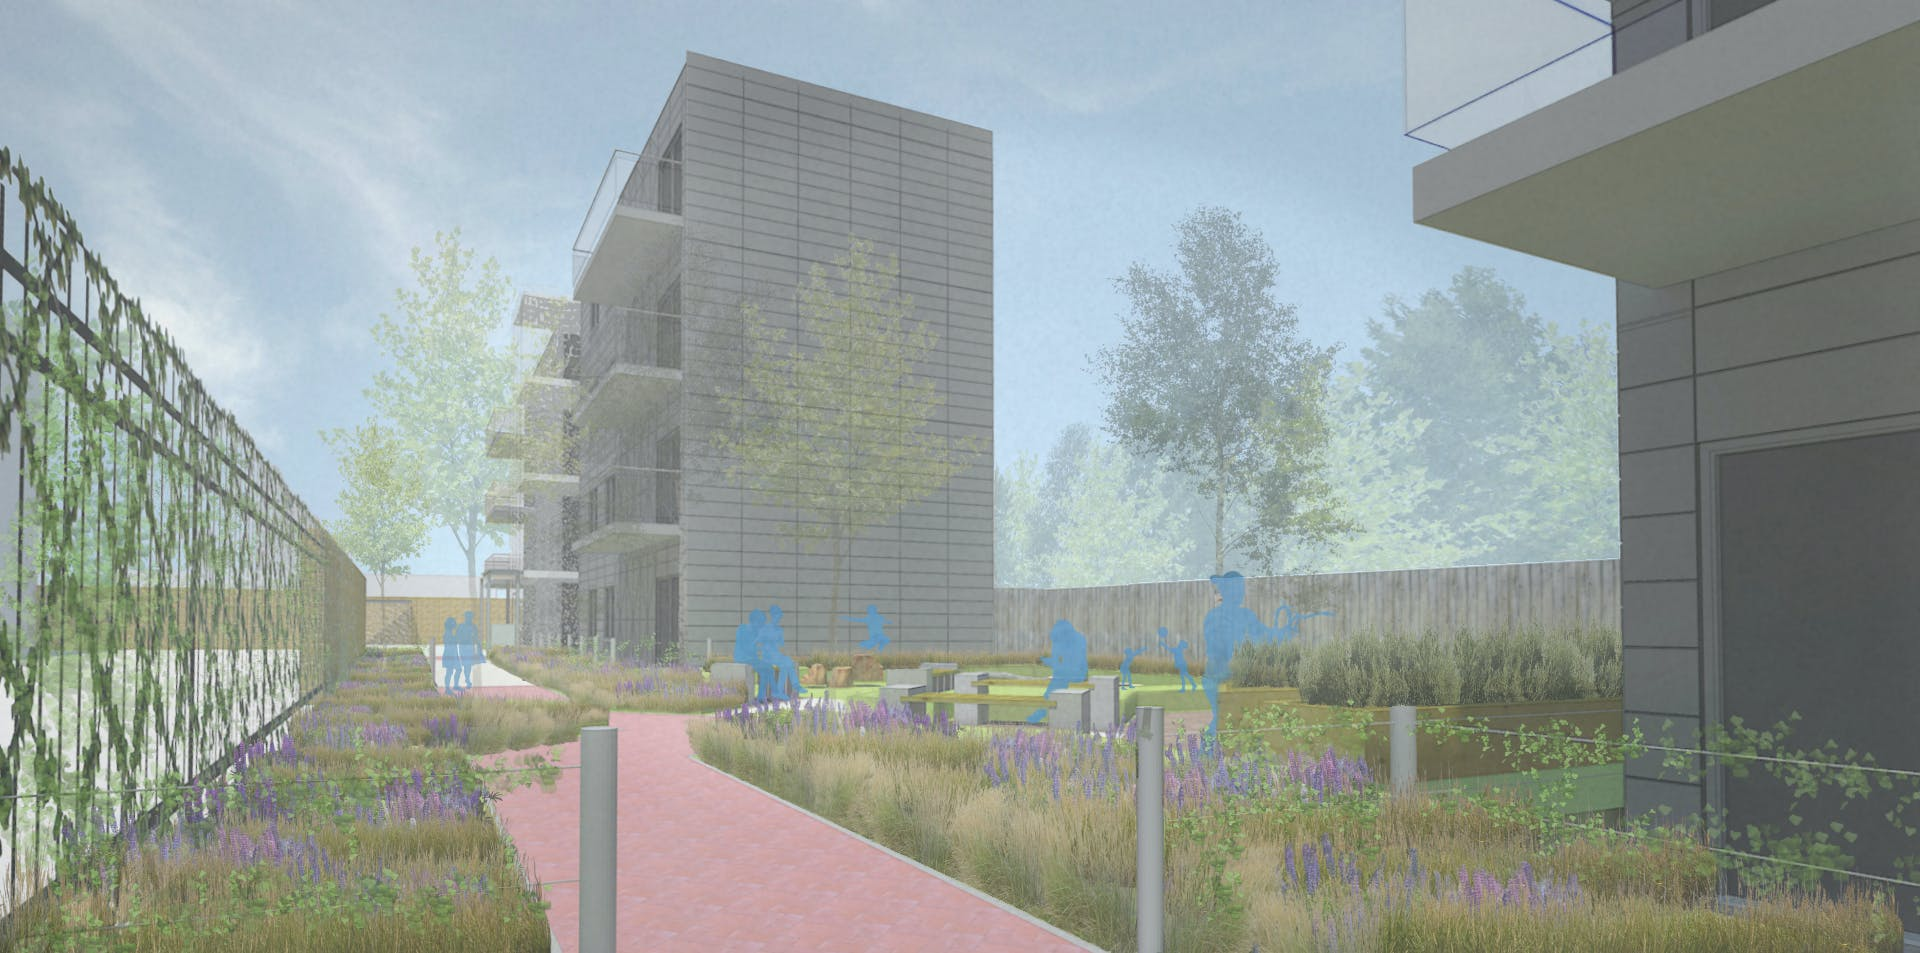 Architect image two